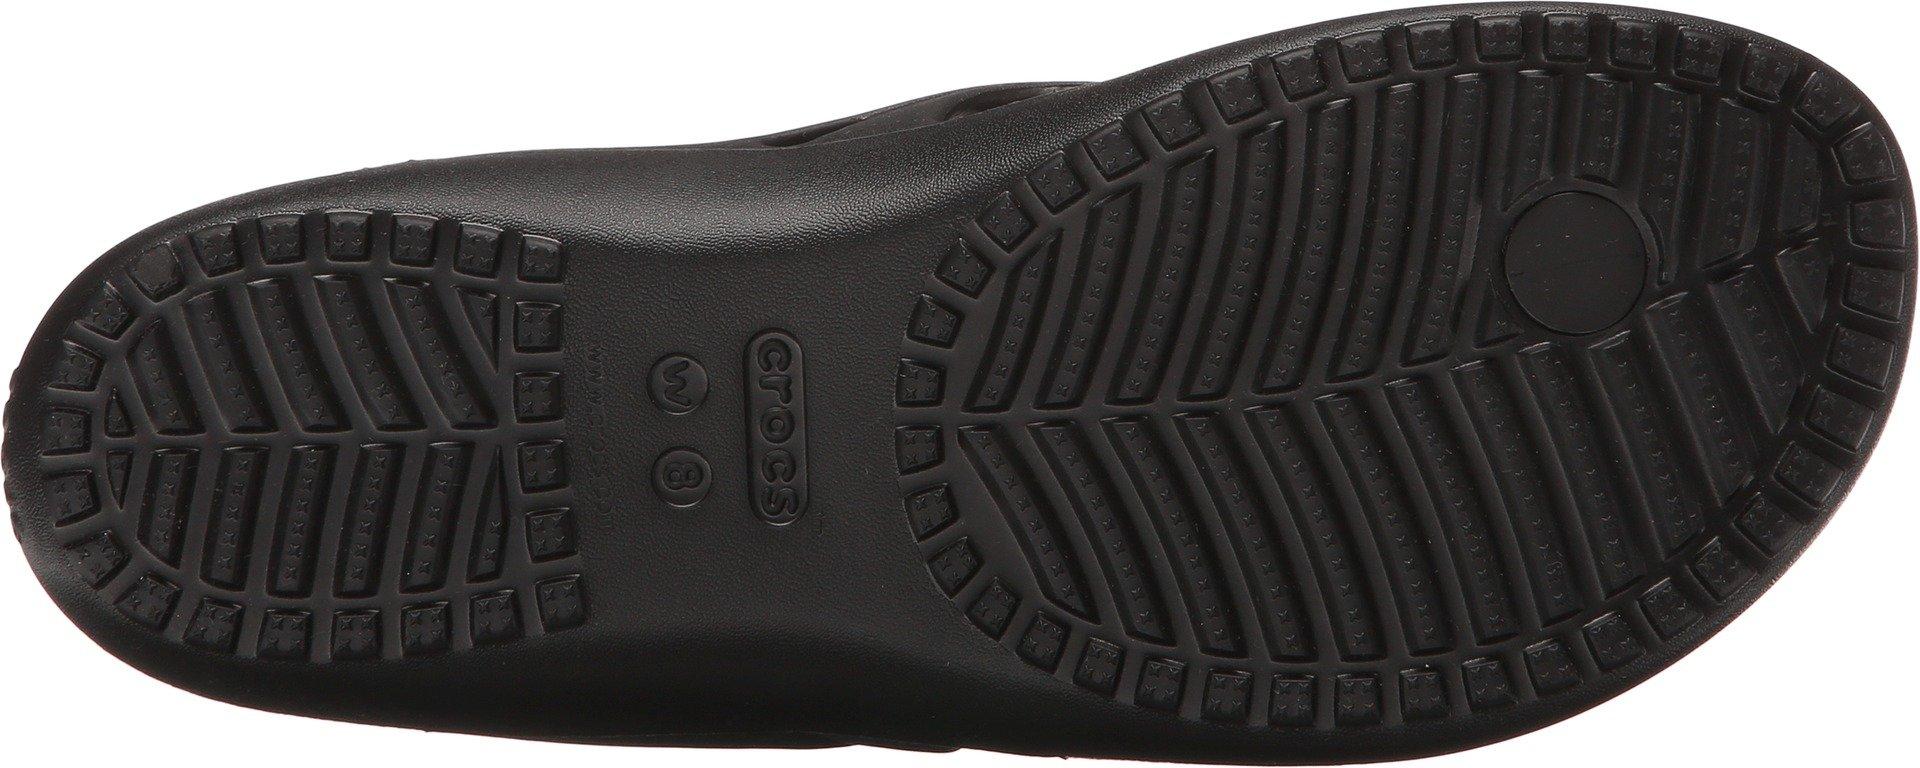 Crocs Womens Kadee Ii Flip Flop, Black, 4 M Us - Choose Szcolor  Ebay-5204